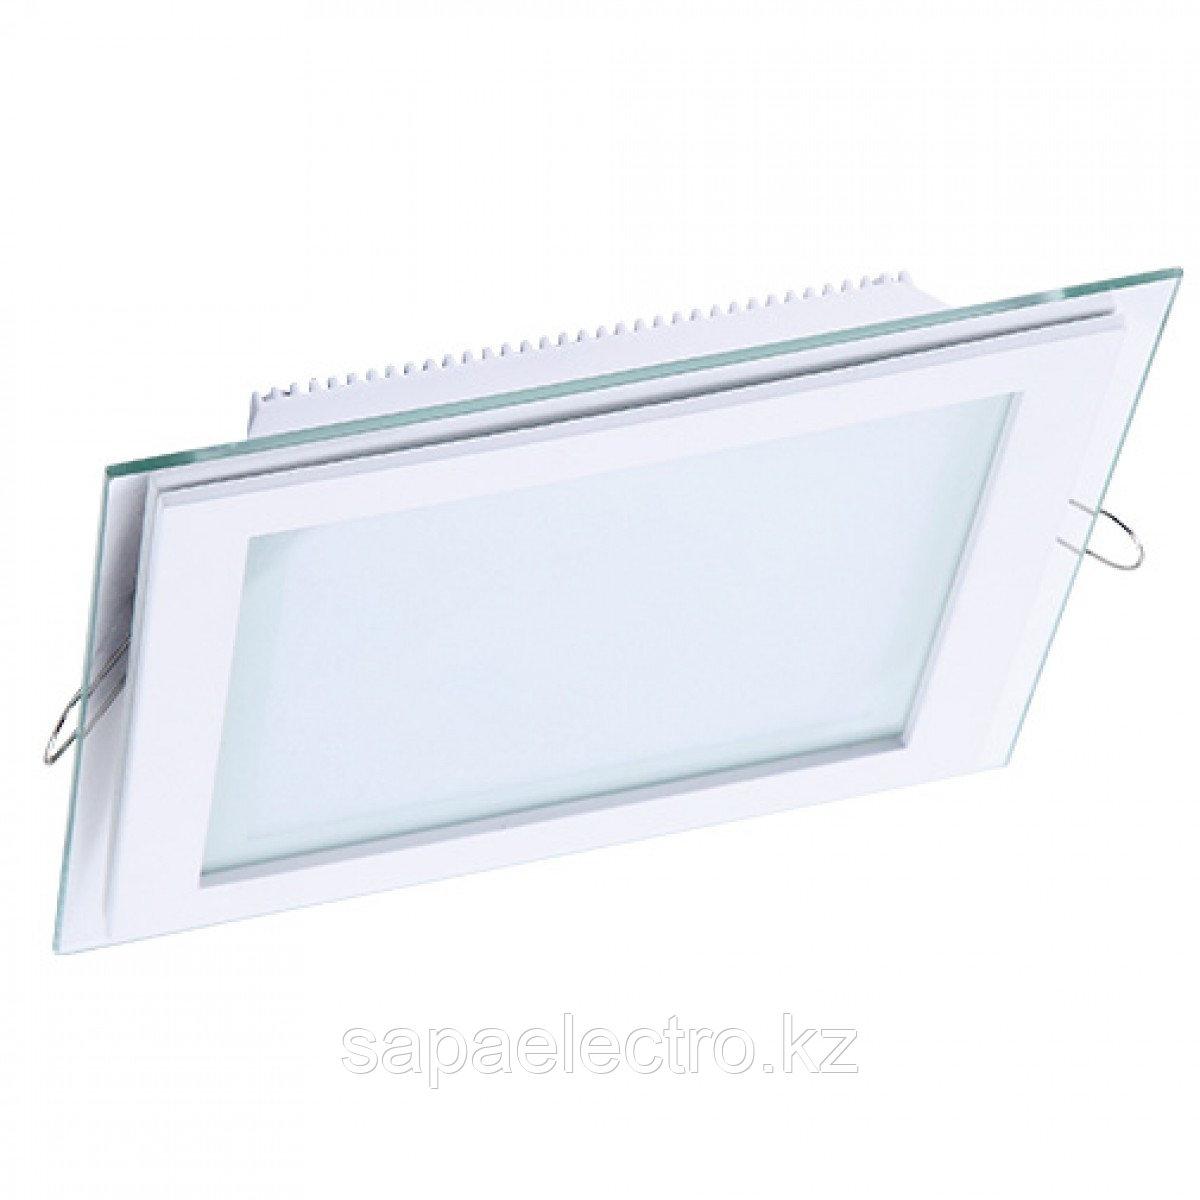 Свет-к DL LED GLASS KVADRO PANEL12W 6000K (TS) 40шт